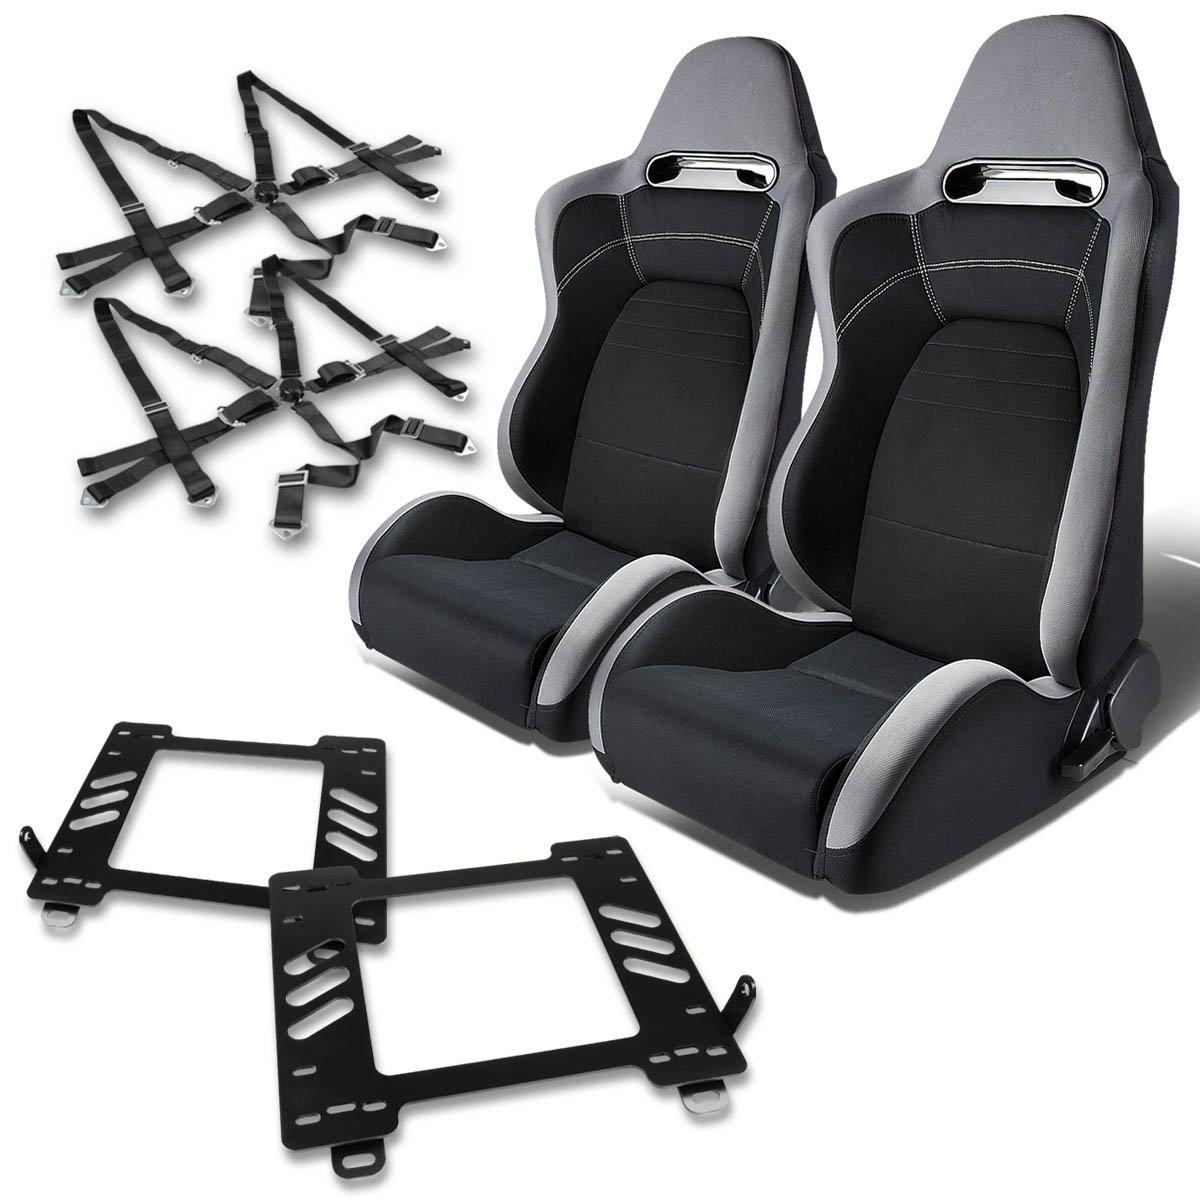 For Mazda Miata MX5 NA Pair of T100 Type-R Racing Seats (Gray & Black)+Seat Bracket+4-Point Green Belt Auto Dynasty